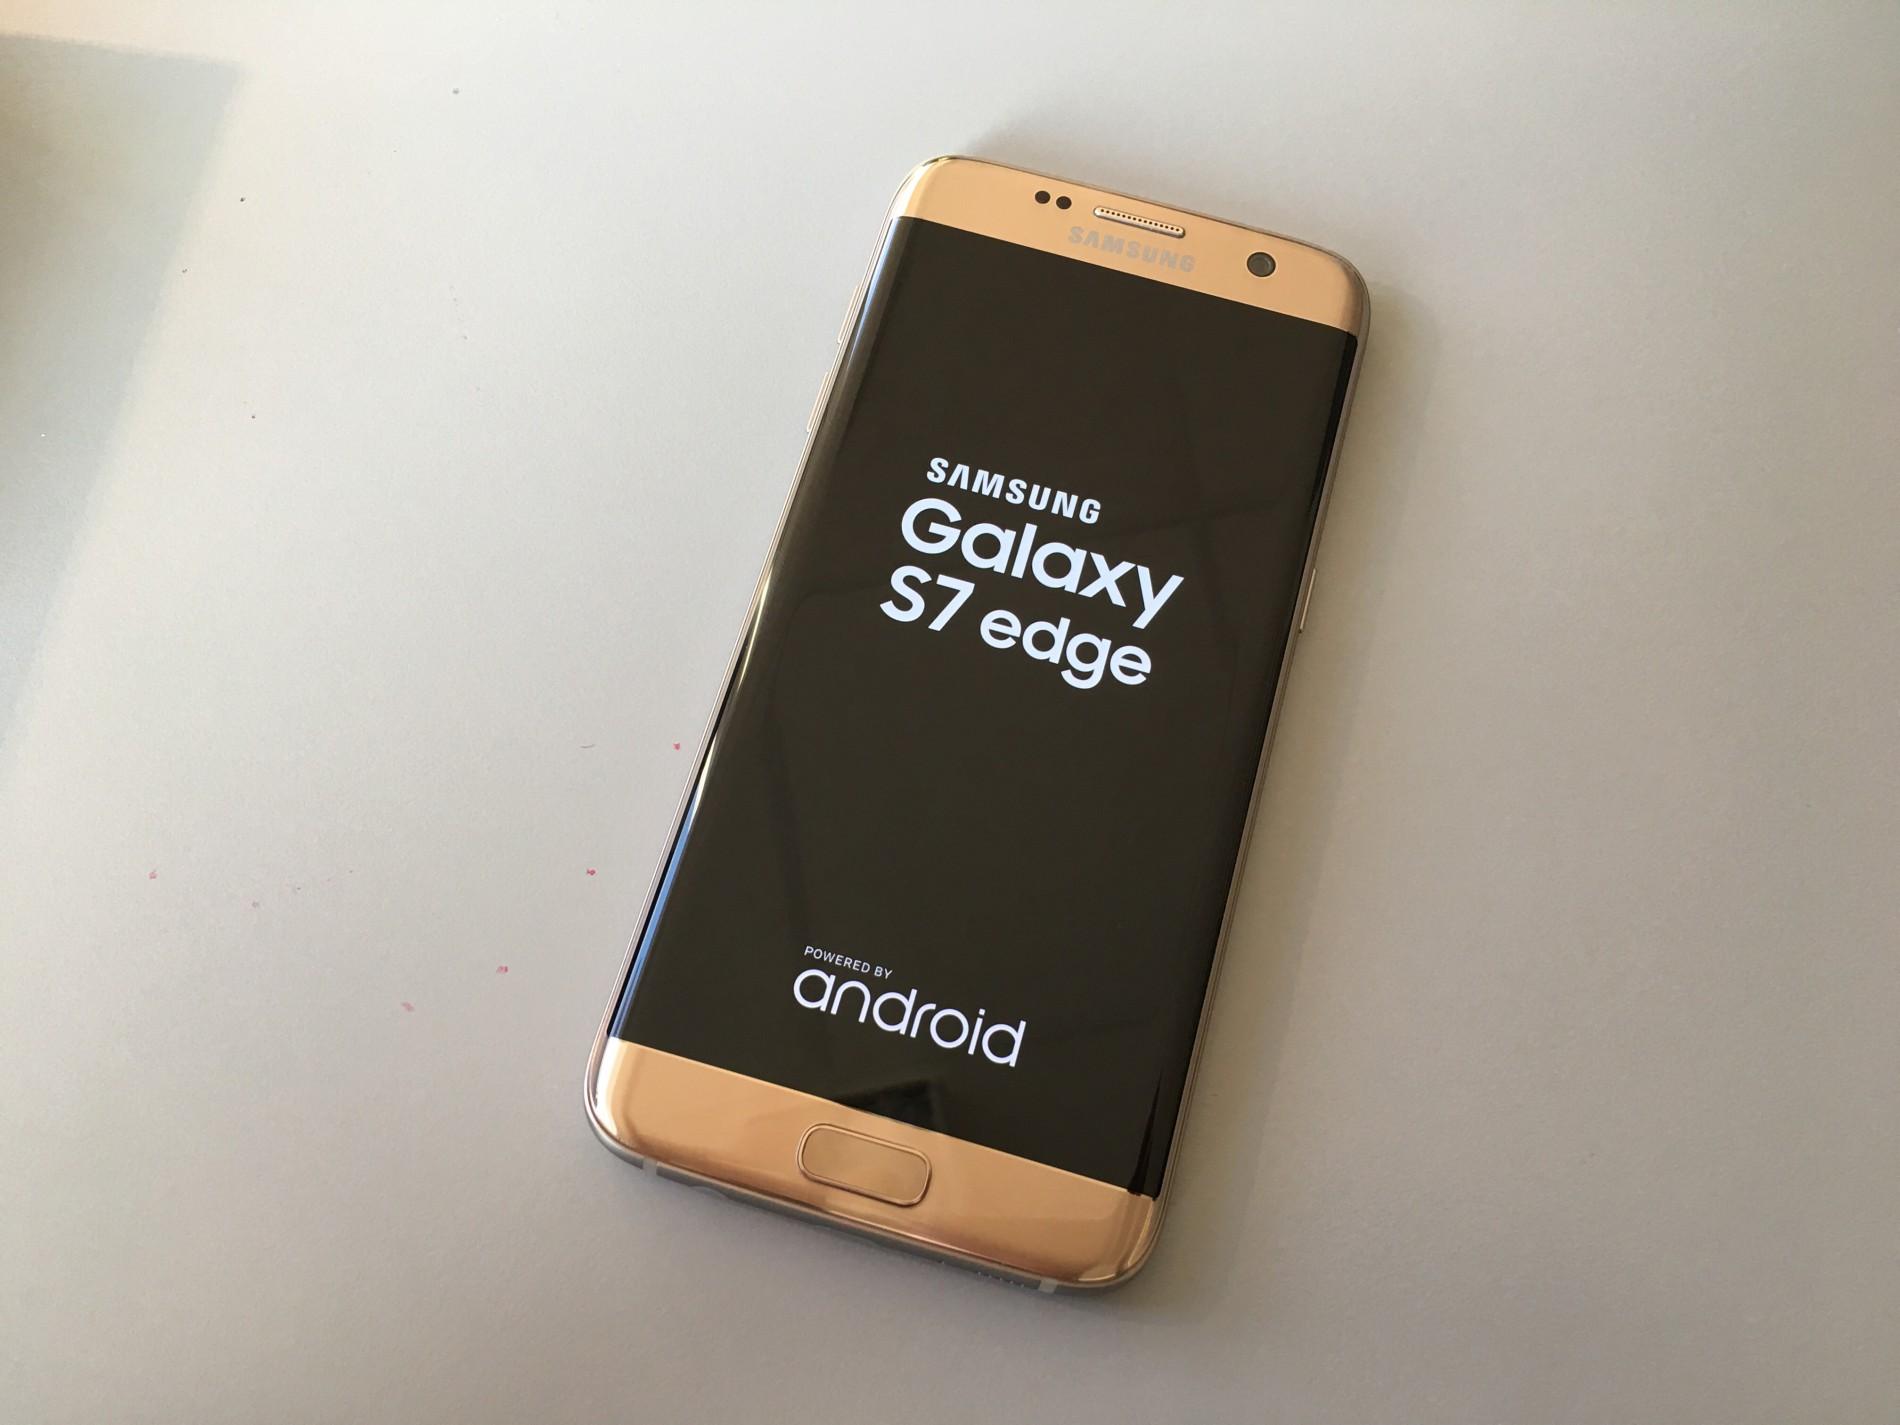 Rekordmange har forudbestilt Samsung Galaxy S7 og S7 edge